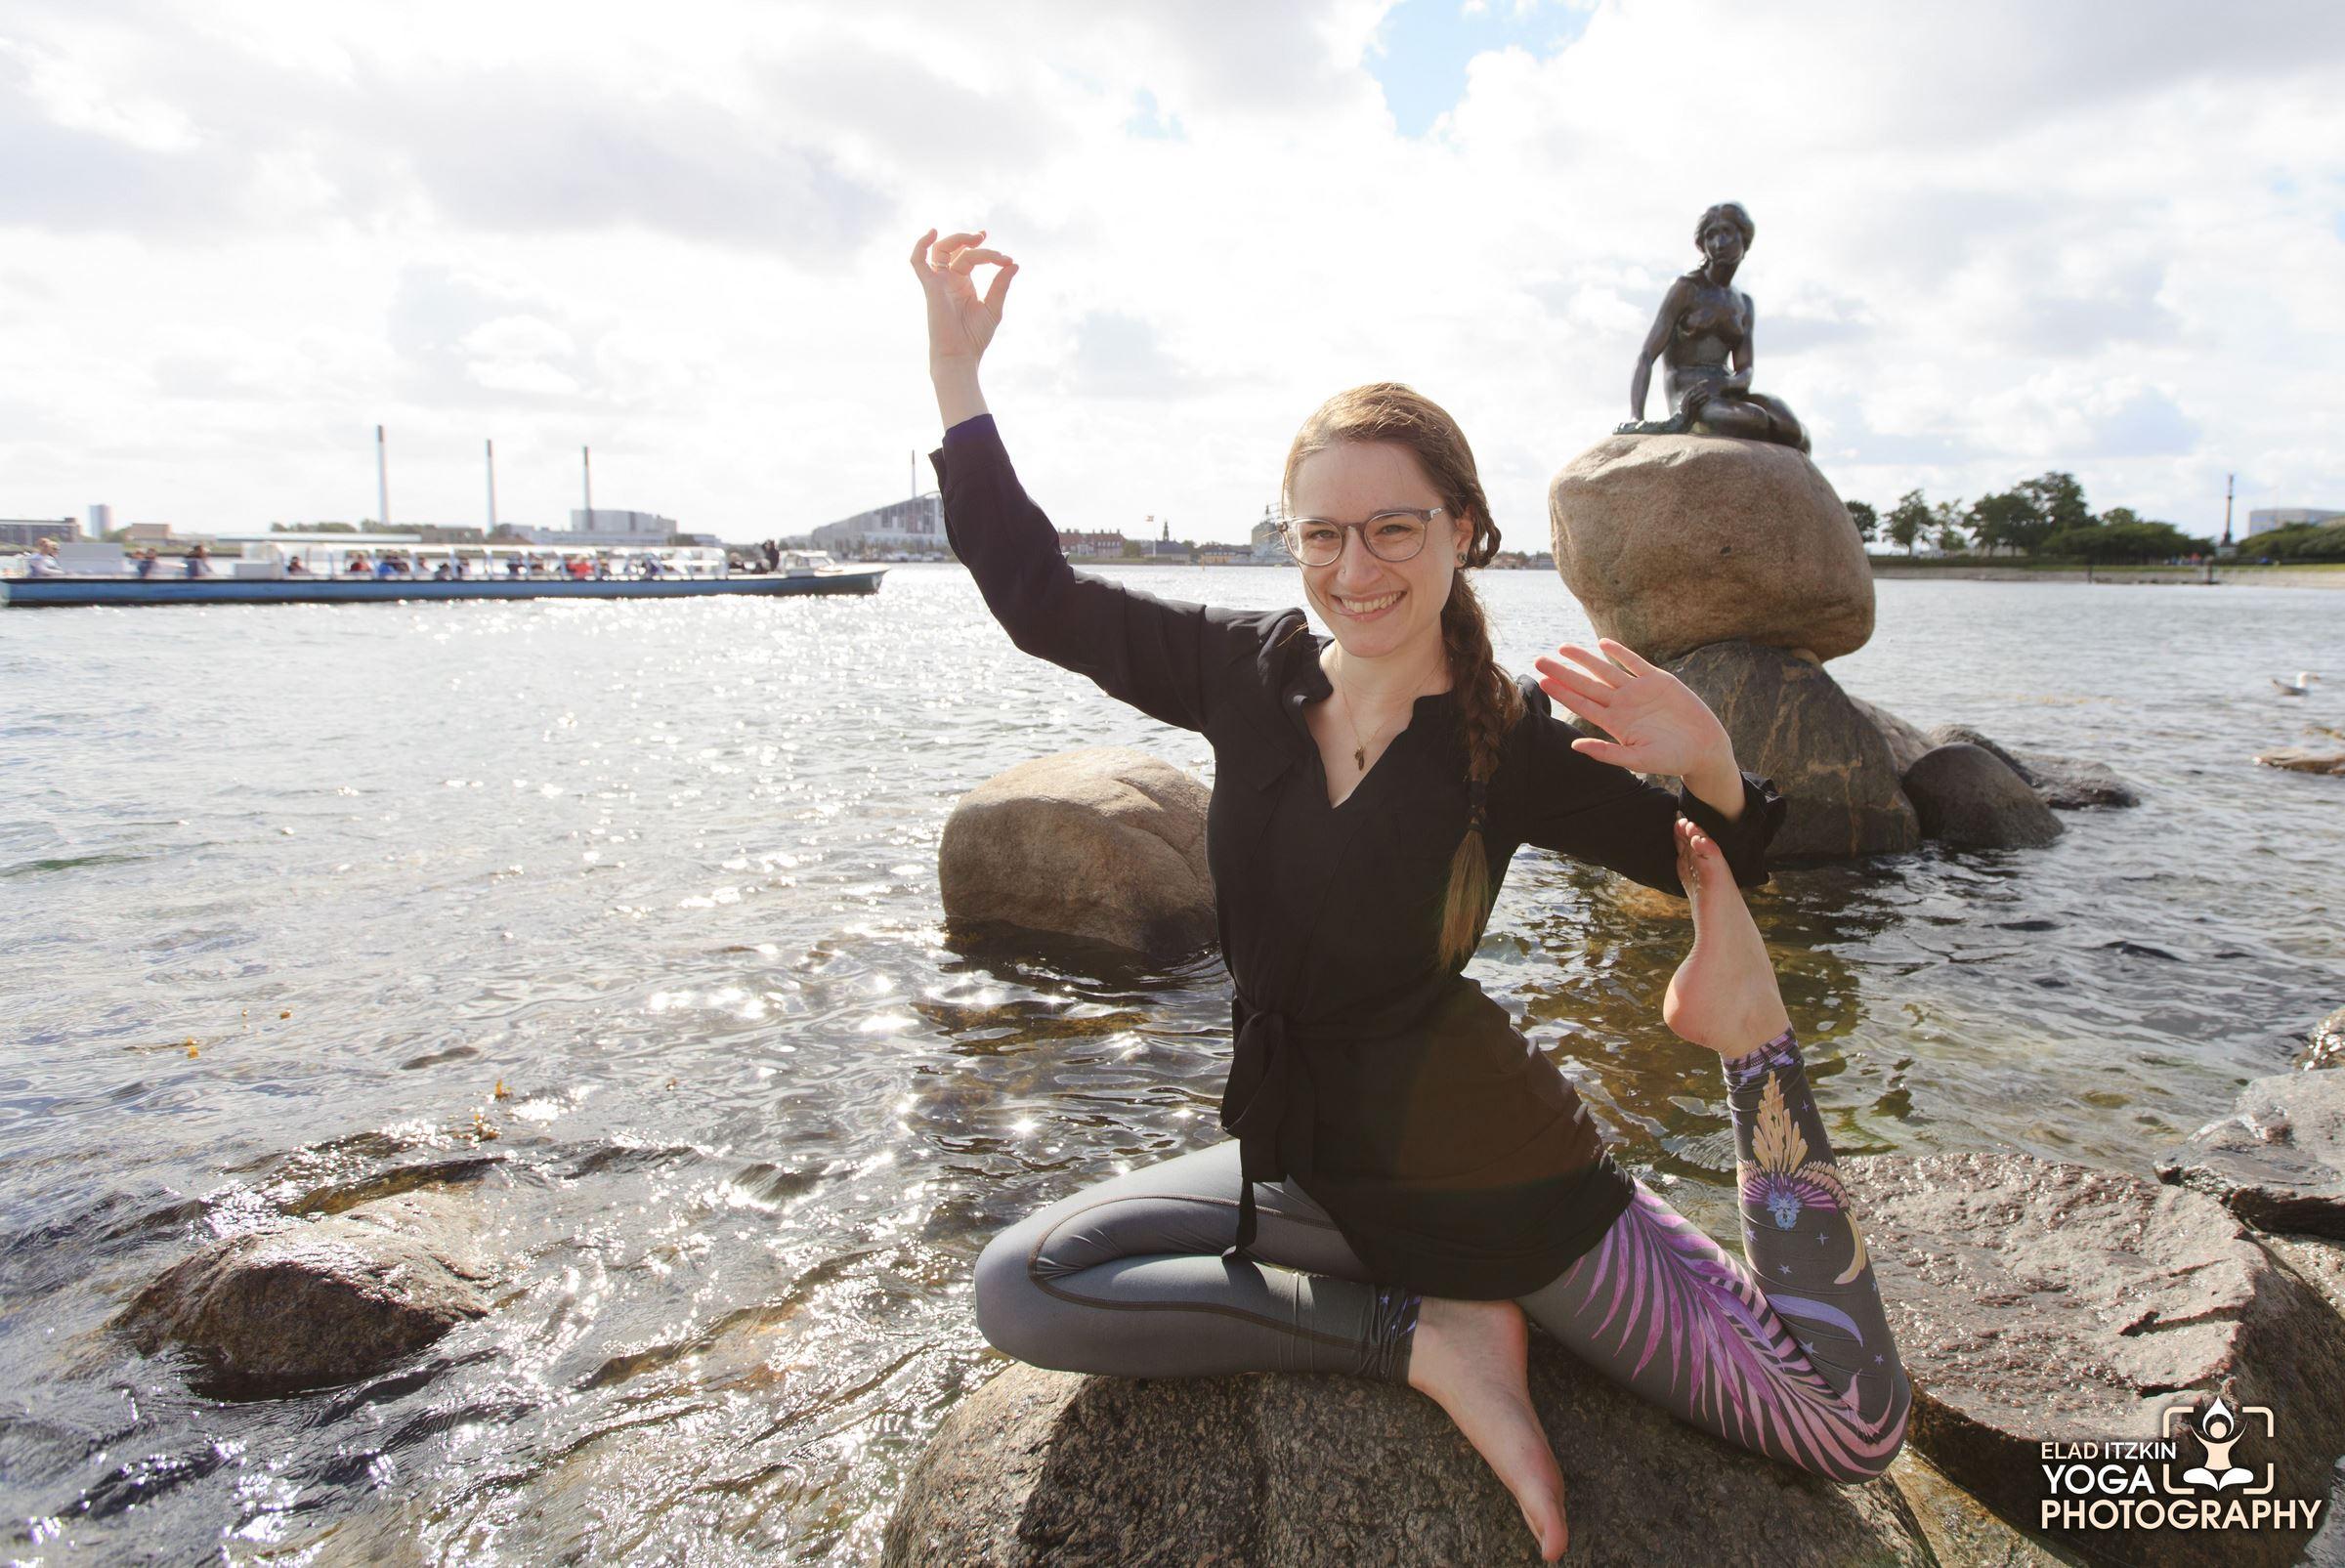 Marie Lind Finsterbach - Elad Itzkin Yoga Photography - Copenhagen - Denmark 0311